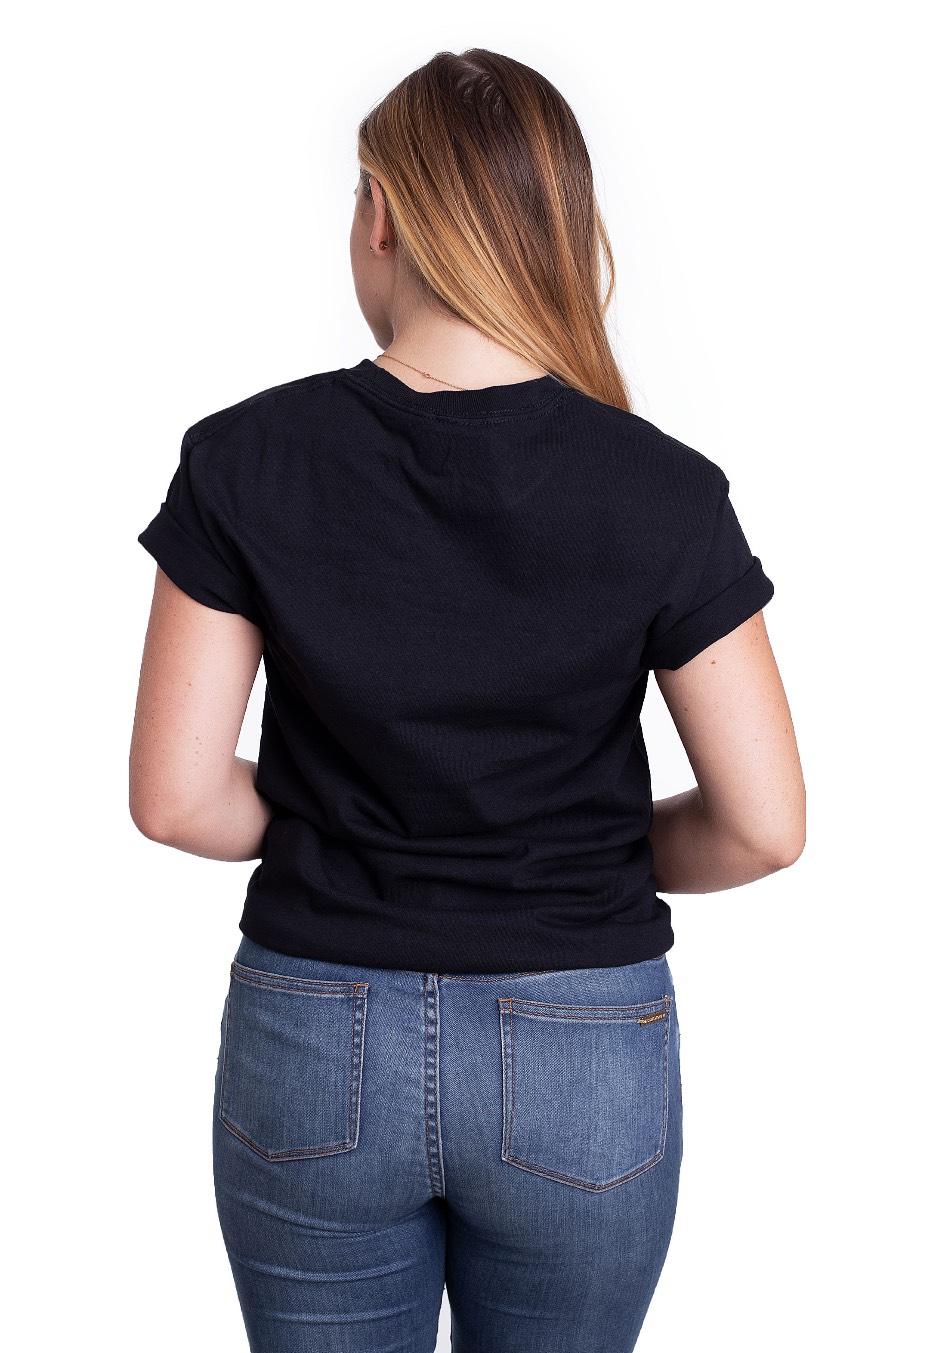 55042dd42f1b Thrasher - Flame Halftone Black - T-Shirt - Loja de streetwear ...